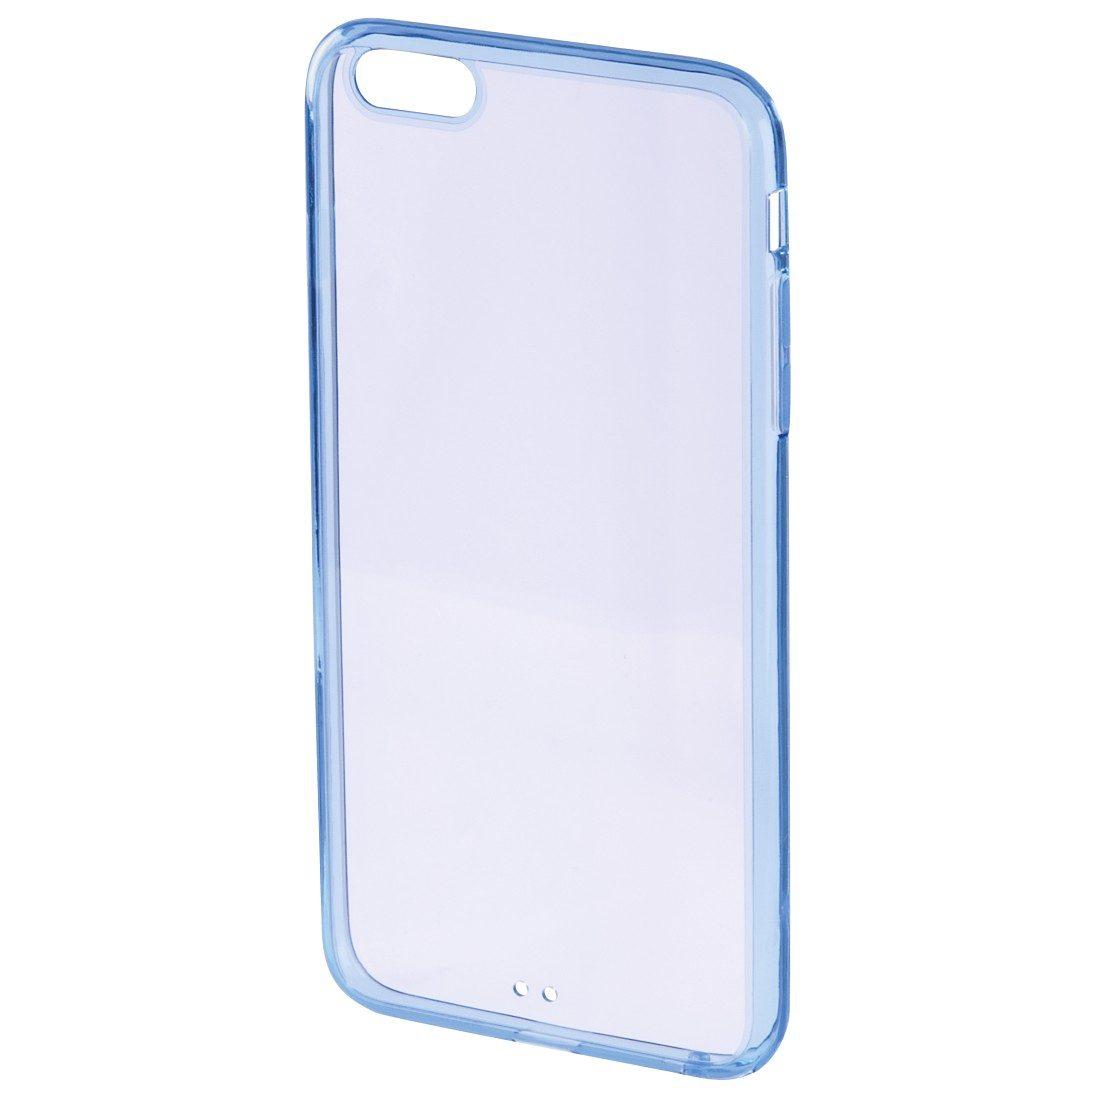 Hama Cover Frame für Apple iPhone 6/6s, Blau